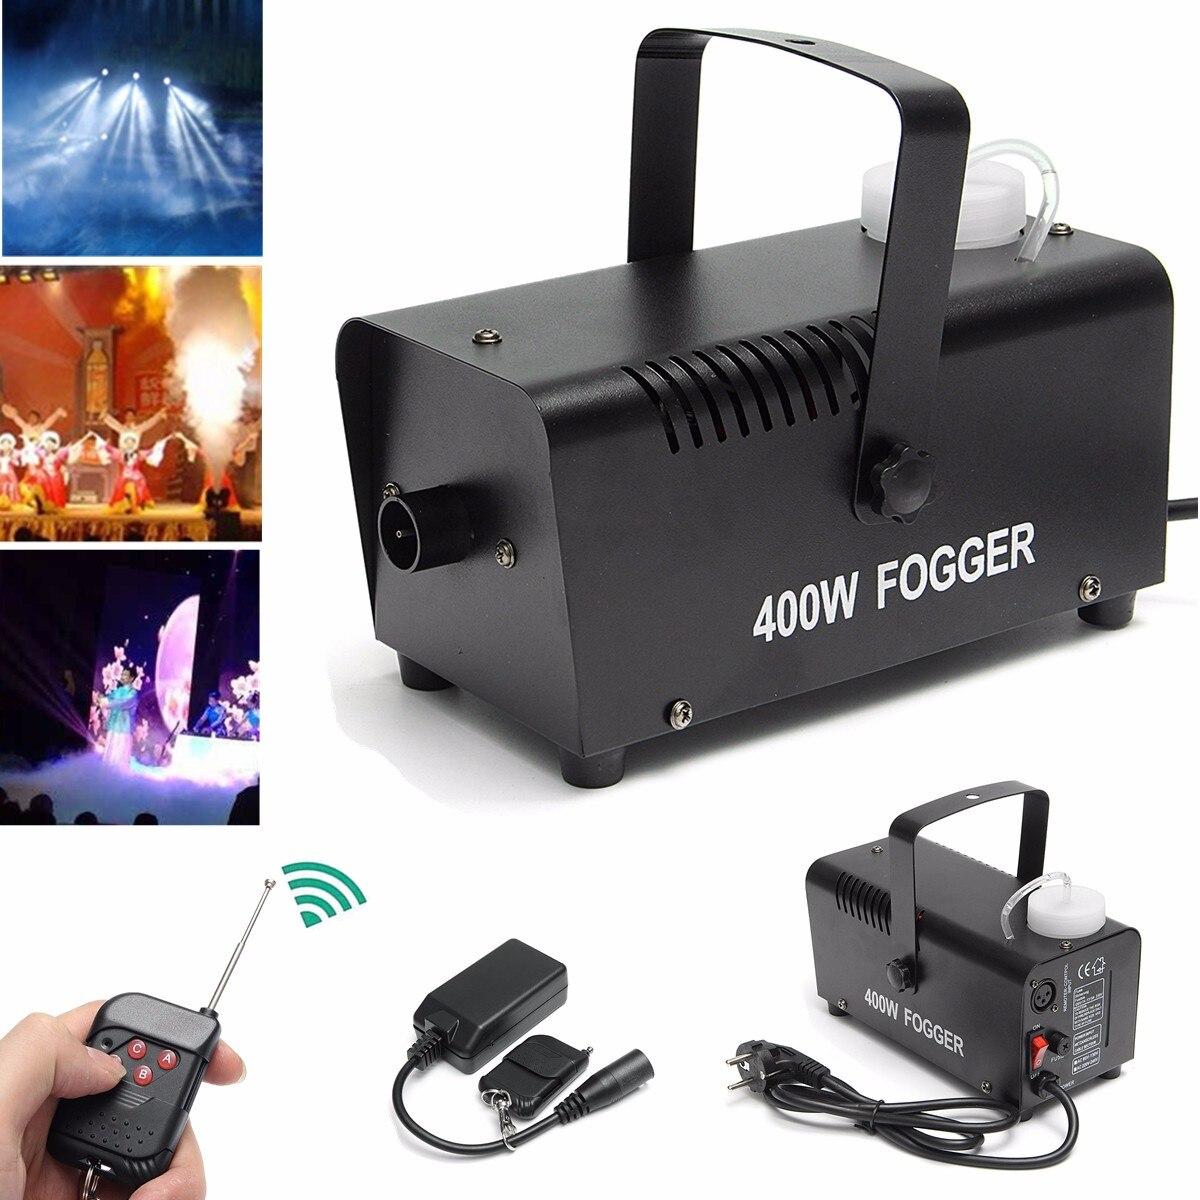 Mini LED RGB Wireless 400W Fog Smoke Mist Machine Stage Effect Disco DJ Party Christmas With Remote Control LED Fogger(China)